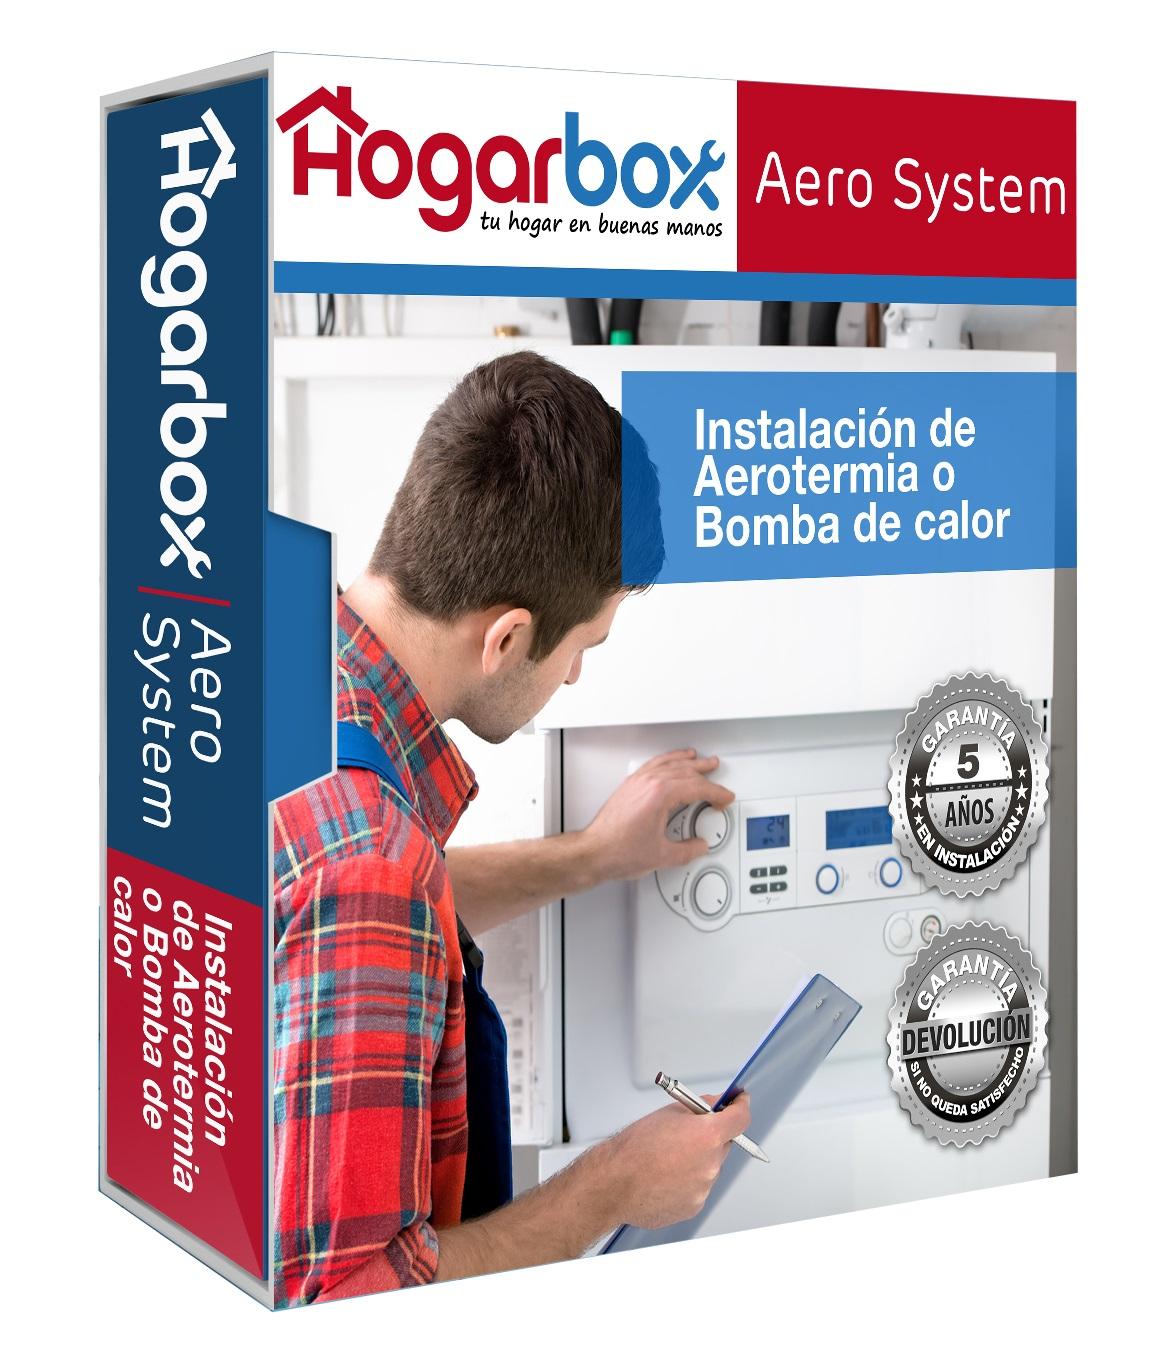 Hogarbox aero system instalaci n de aerotermia o bomba de - Bomba de calor opiniones ...